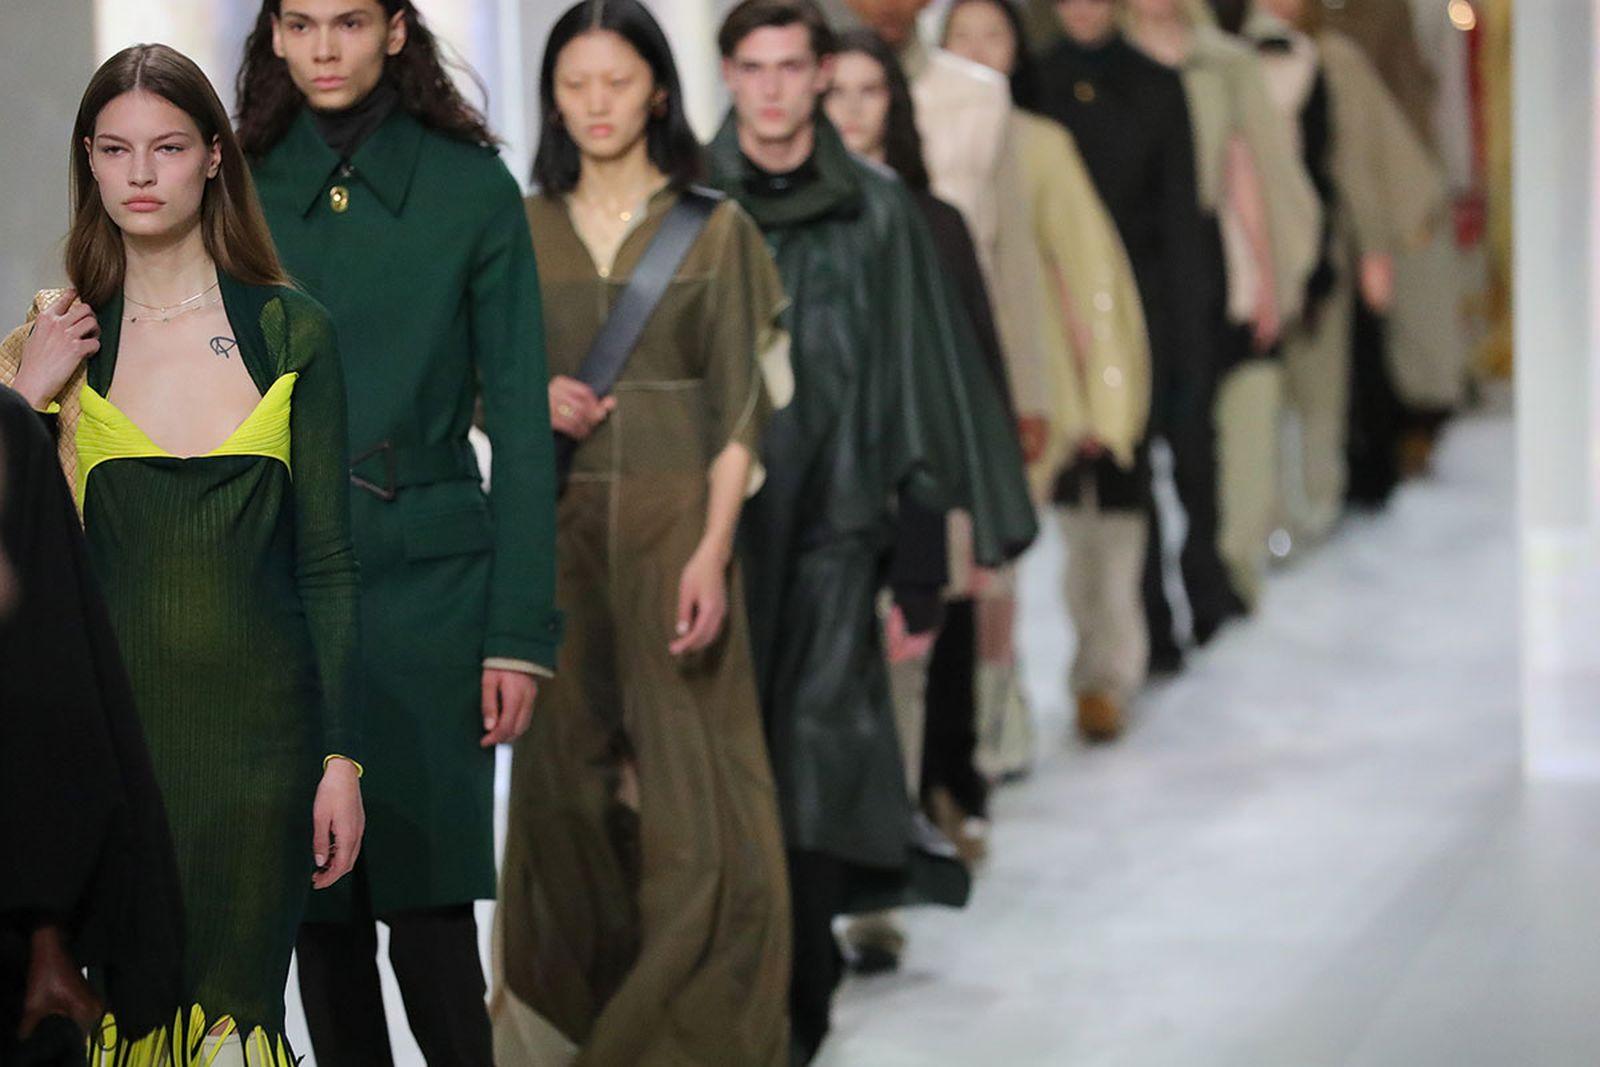 odels walk the runway during the Bottega Veneta fashion show